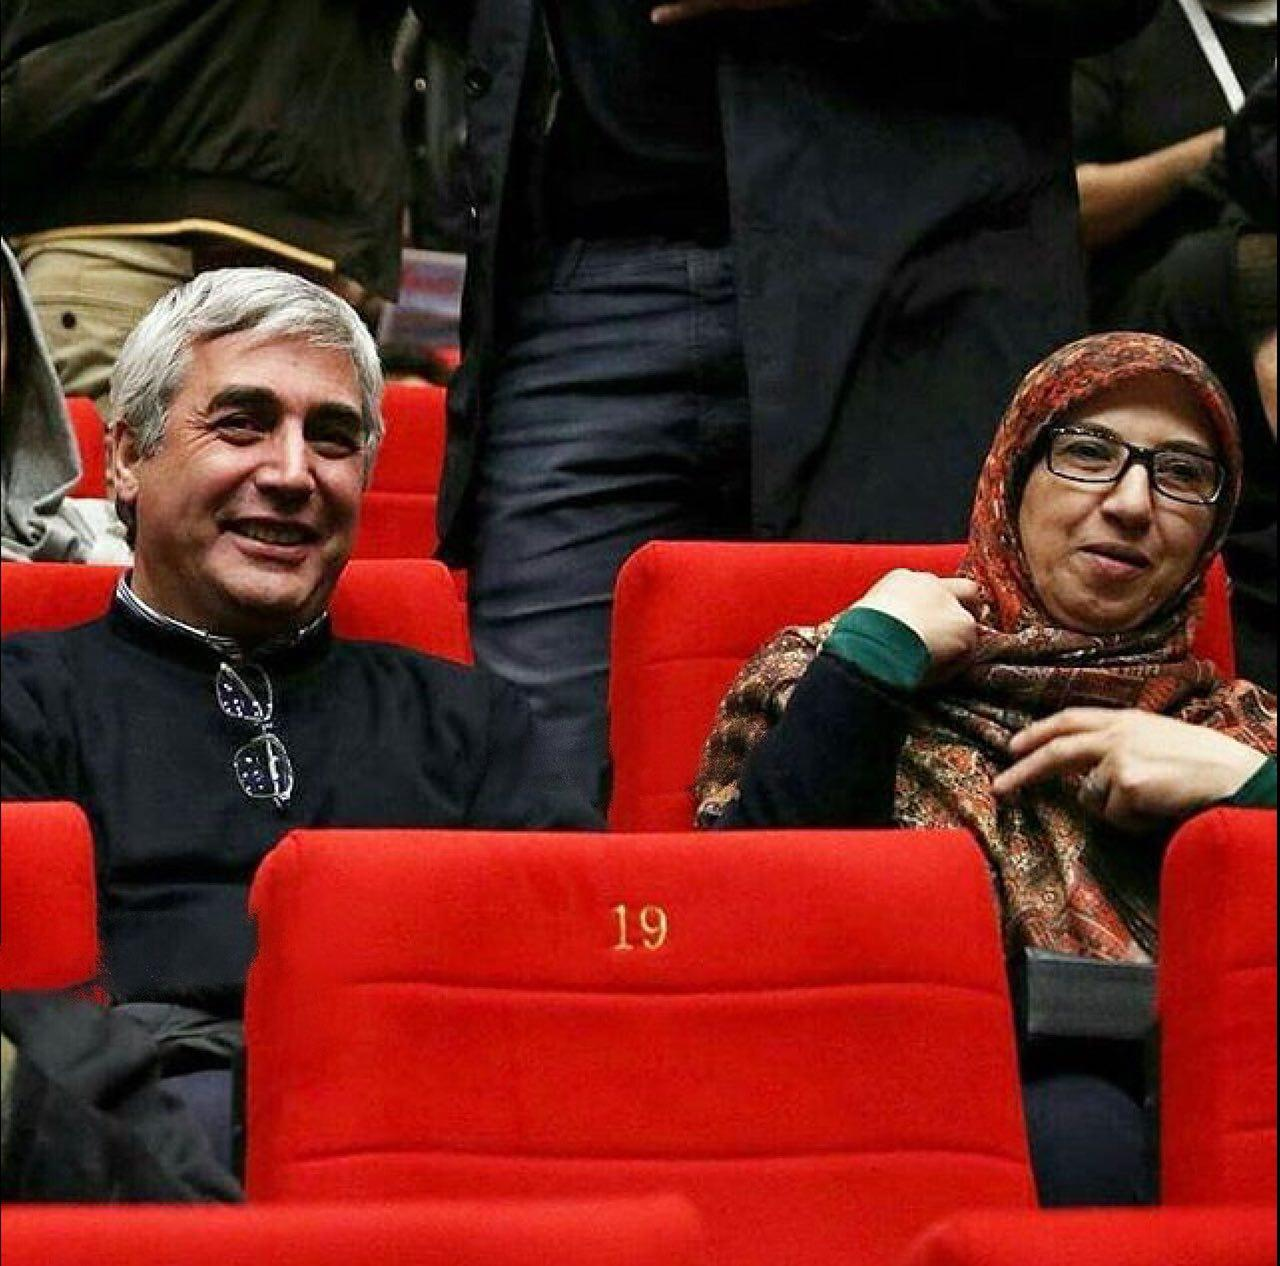 حاتمى كيا همراه همسرش به جشنواره فجر آمد +عکس